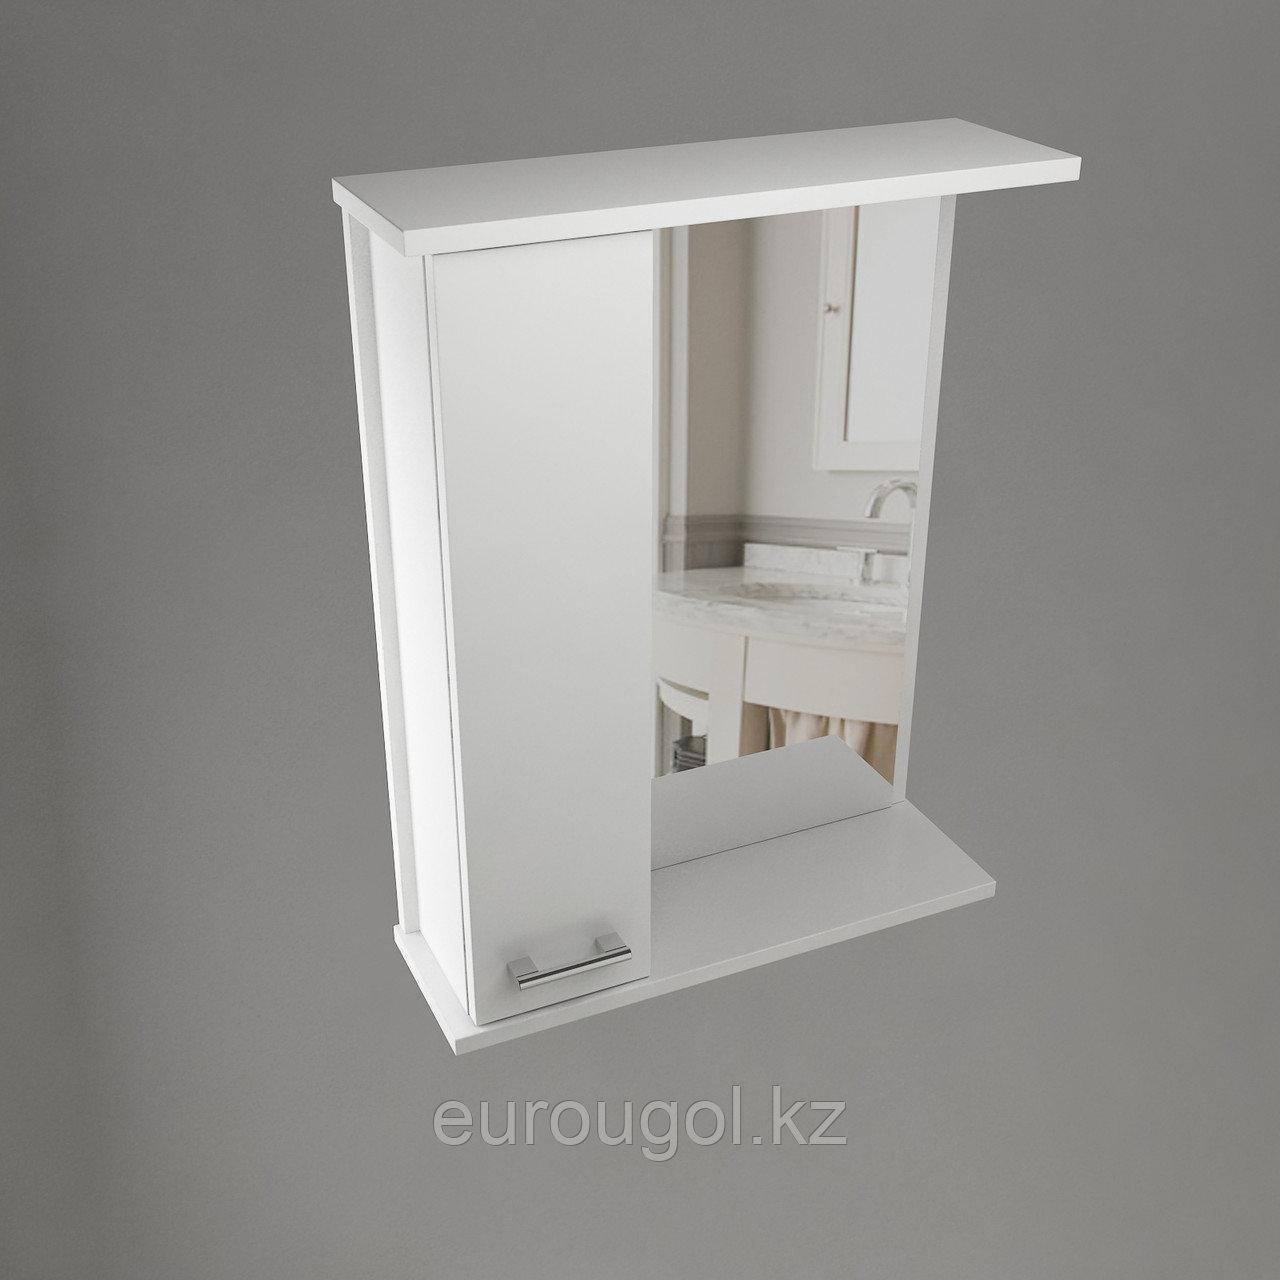 Шкафчик - зеркало для ванной комнаты WaterWorld Стиль 700 мм.